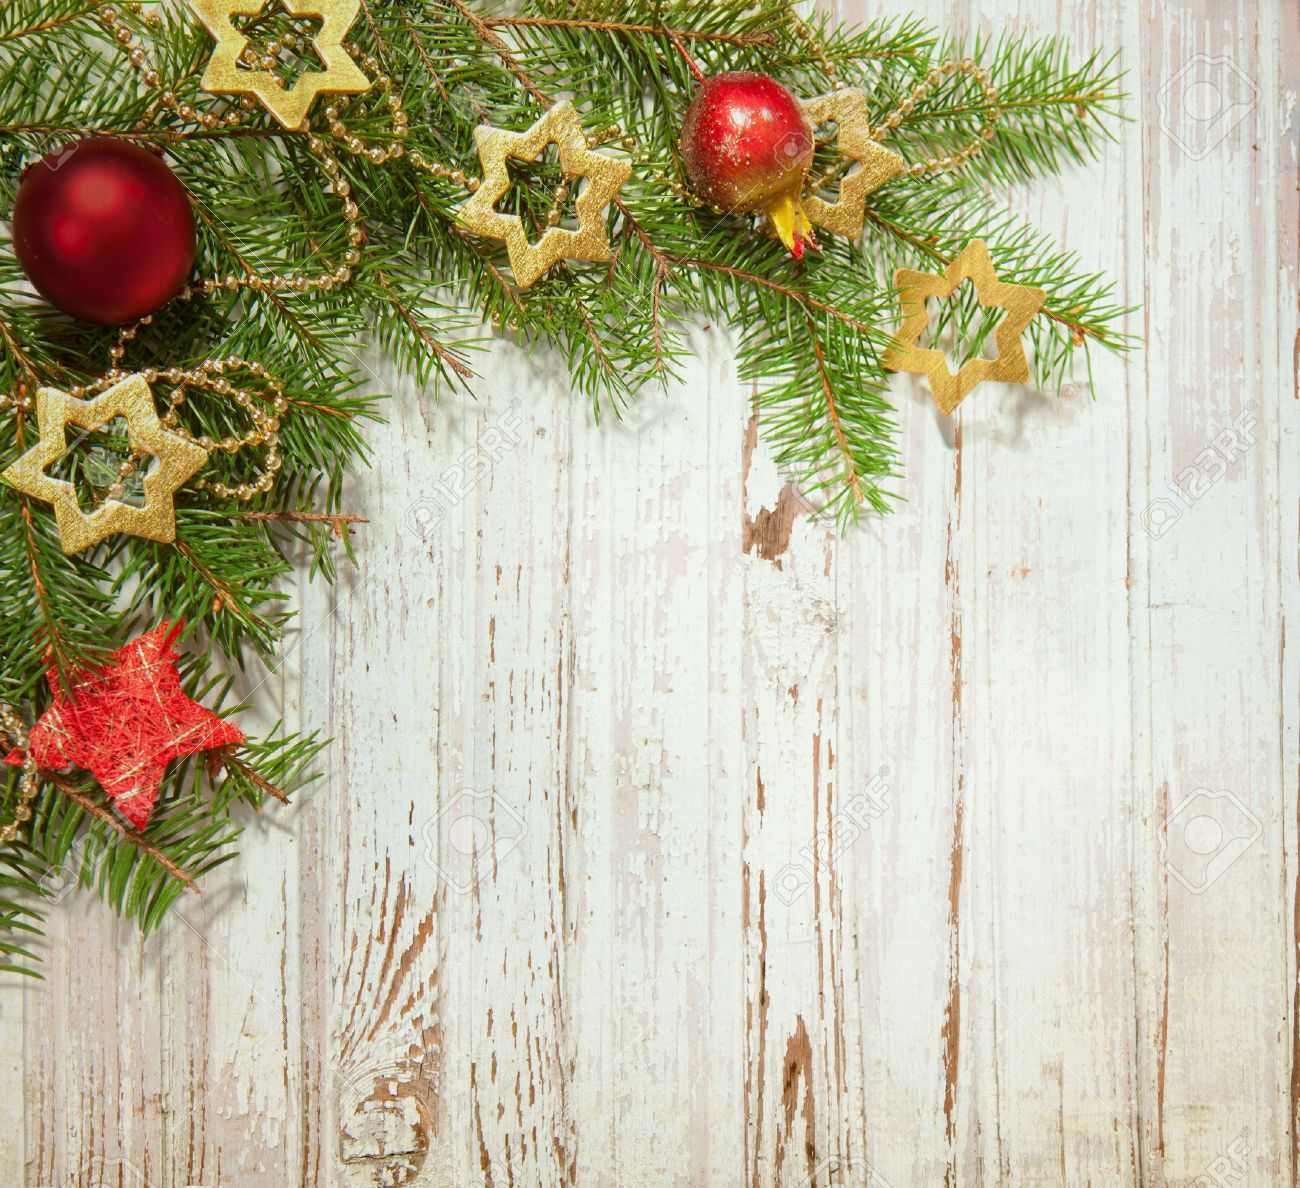 Kerst decoratie op oude houten plank royalty vrije foto, plaatjes ...